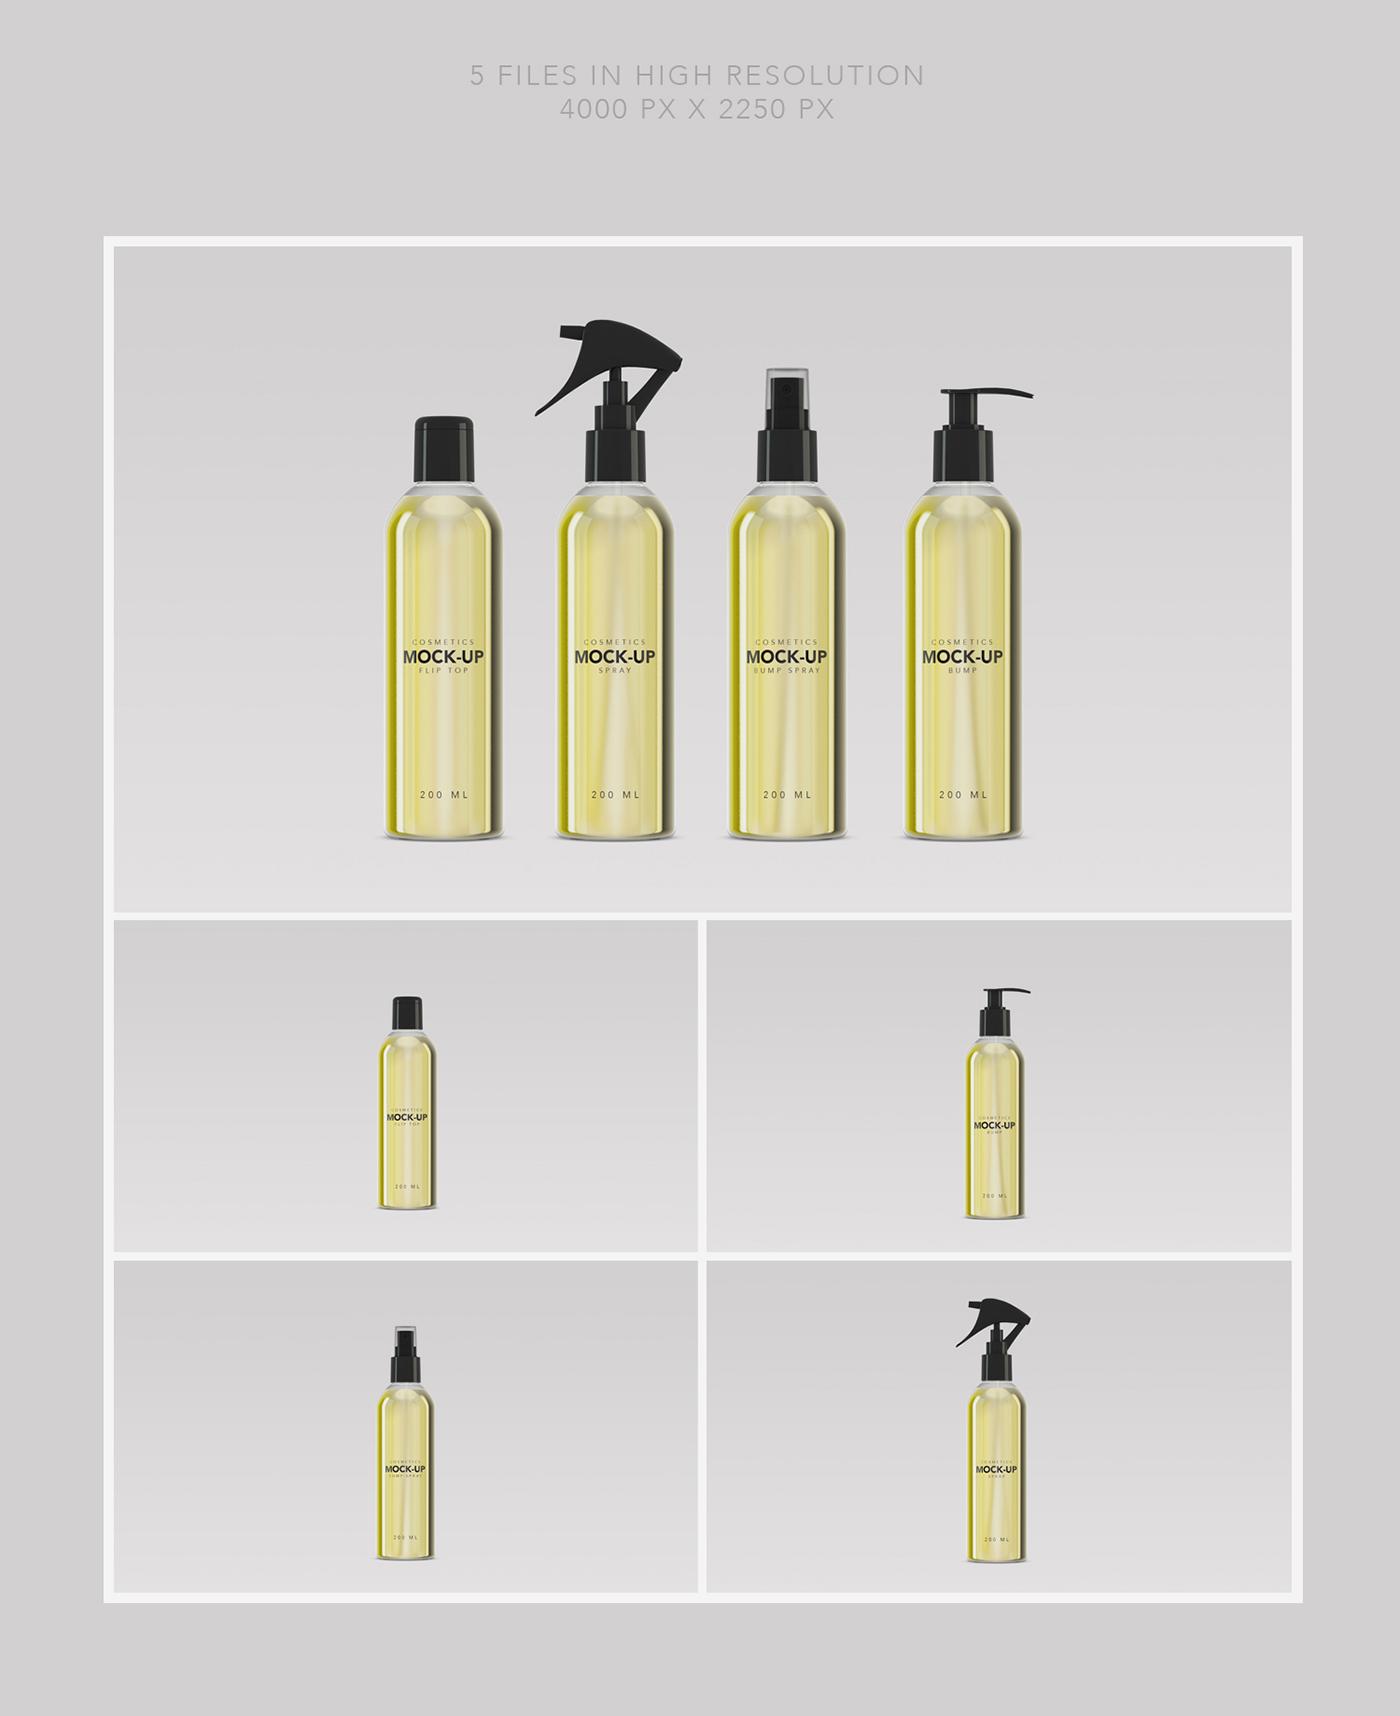 cosmetics Cosmetic cosmetics mockups beauty Mockup mock up mock-up branding mockup 200ml 330ml spray Bump bumpspray